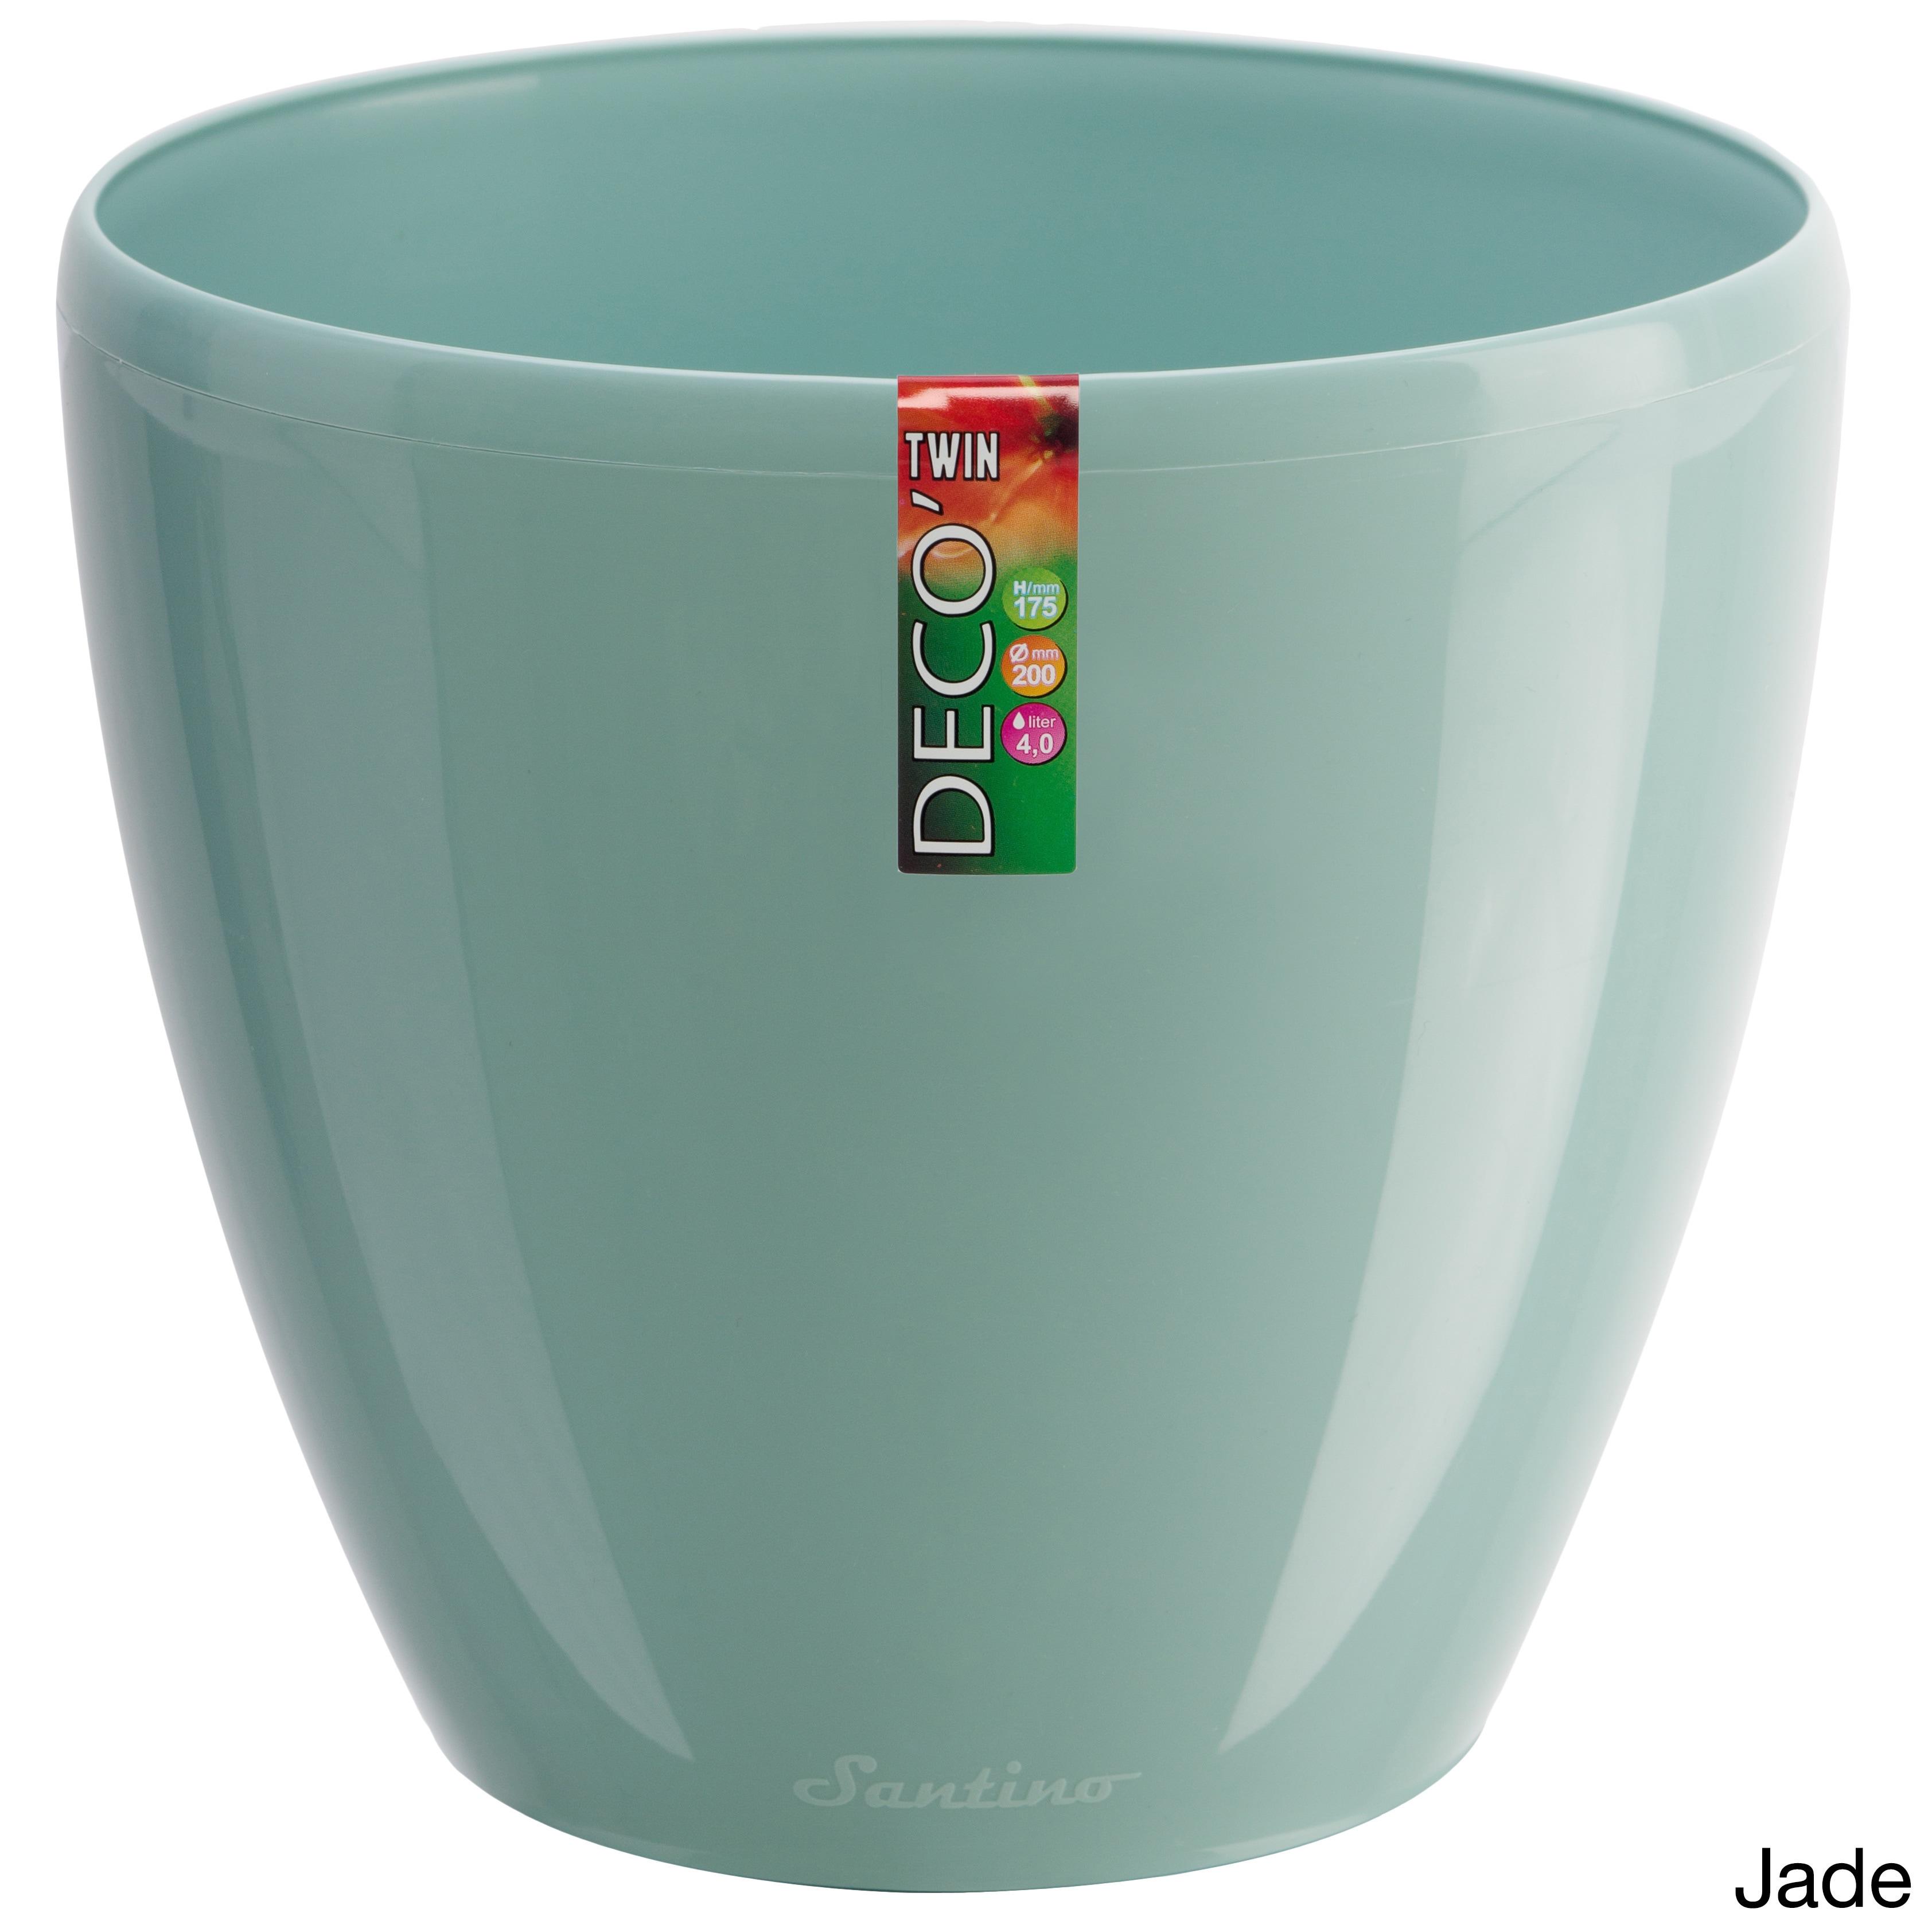 Deco Self-Watering 7.9-inch Planter (Set of 3) (Jade), Bl...